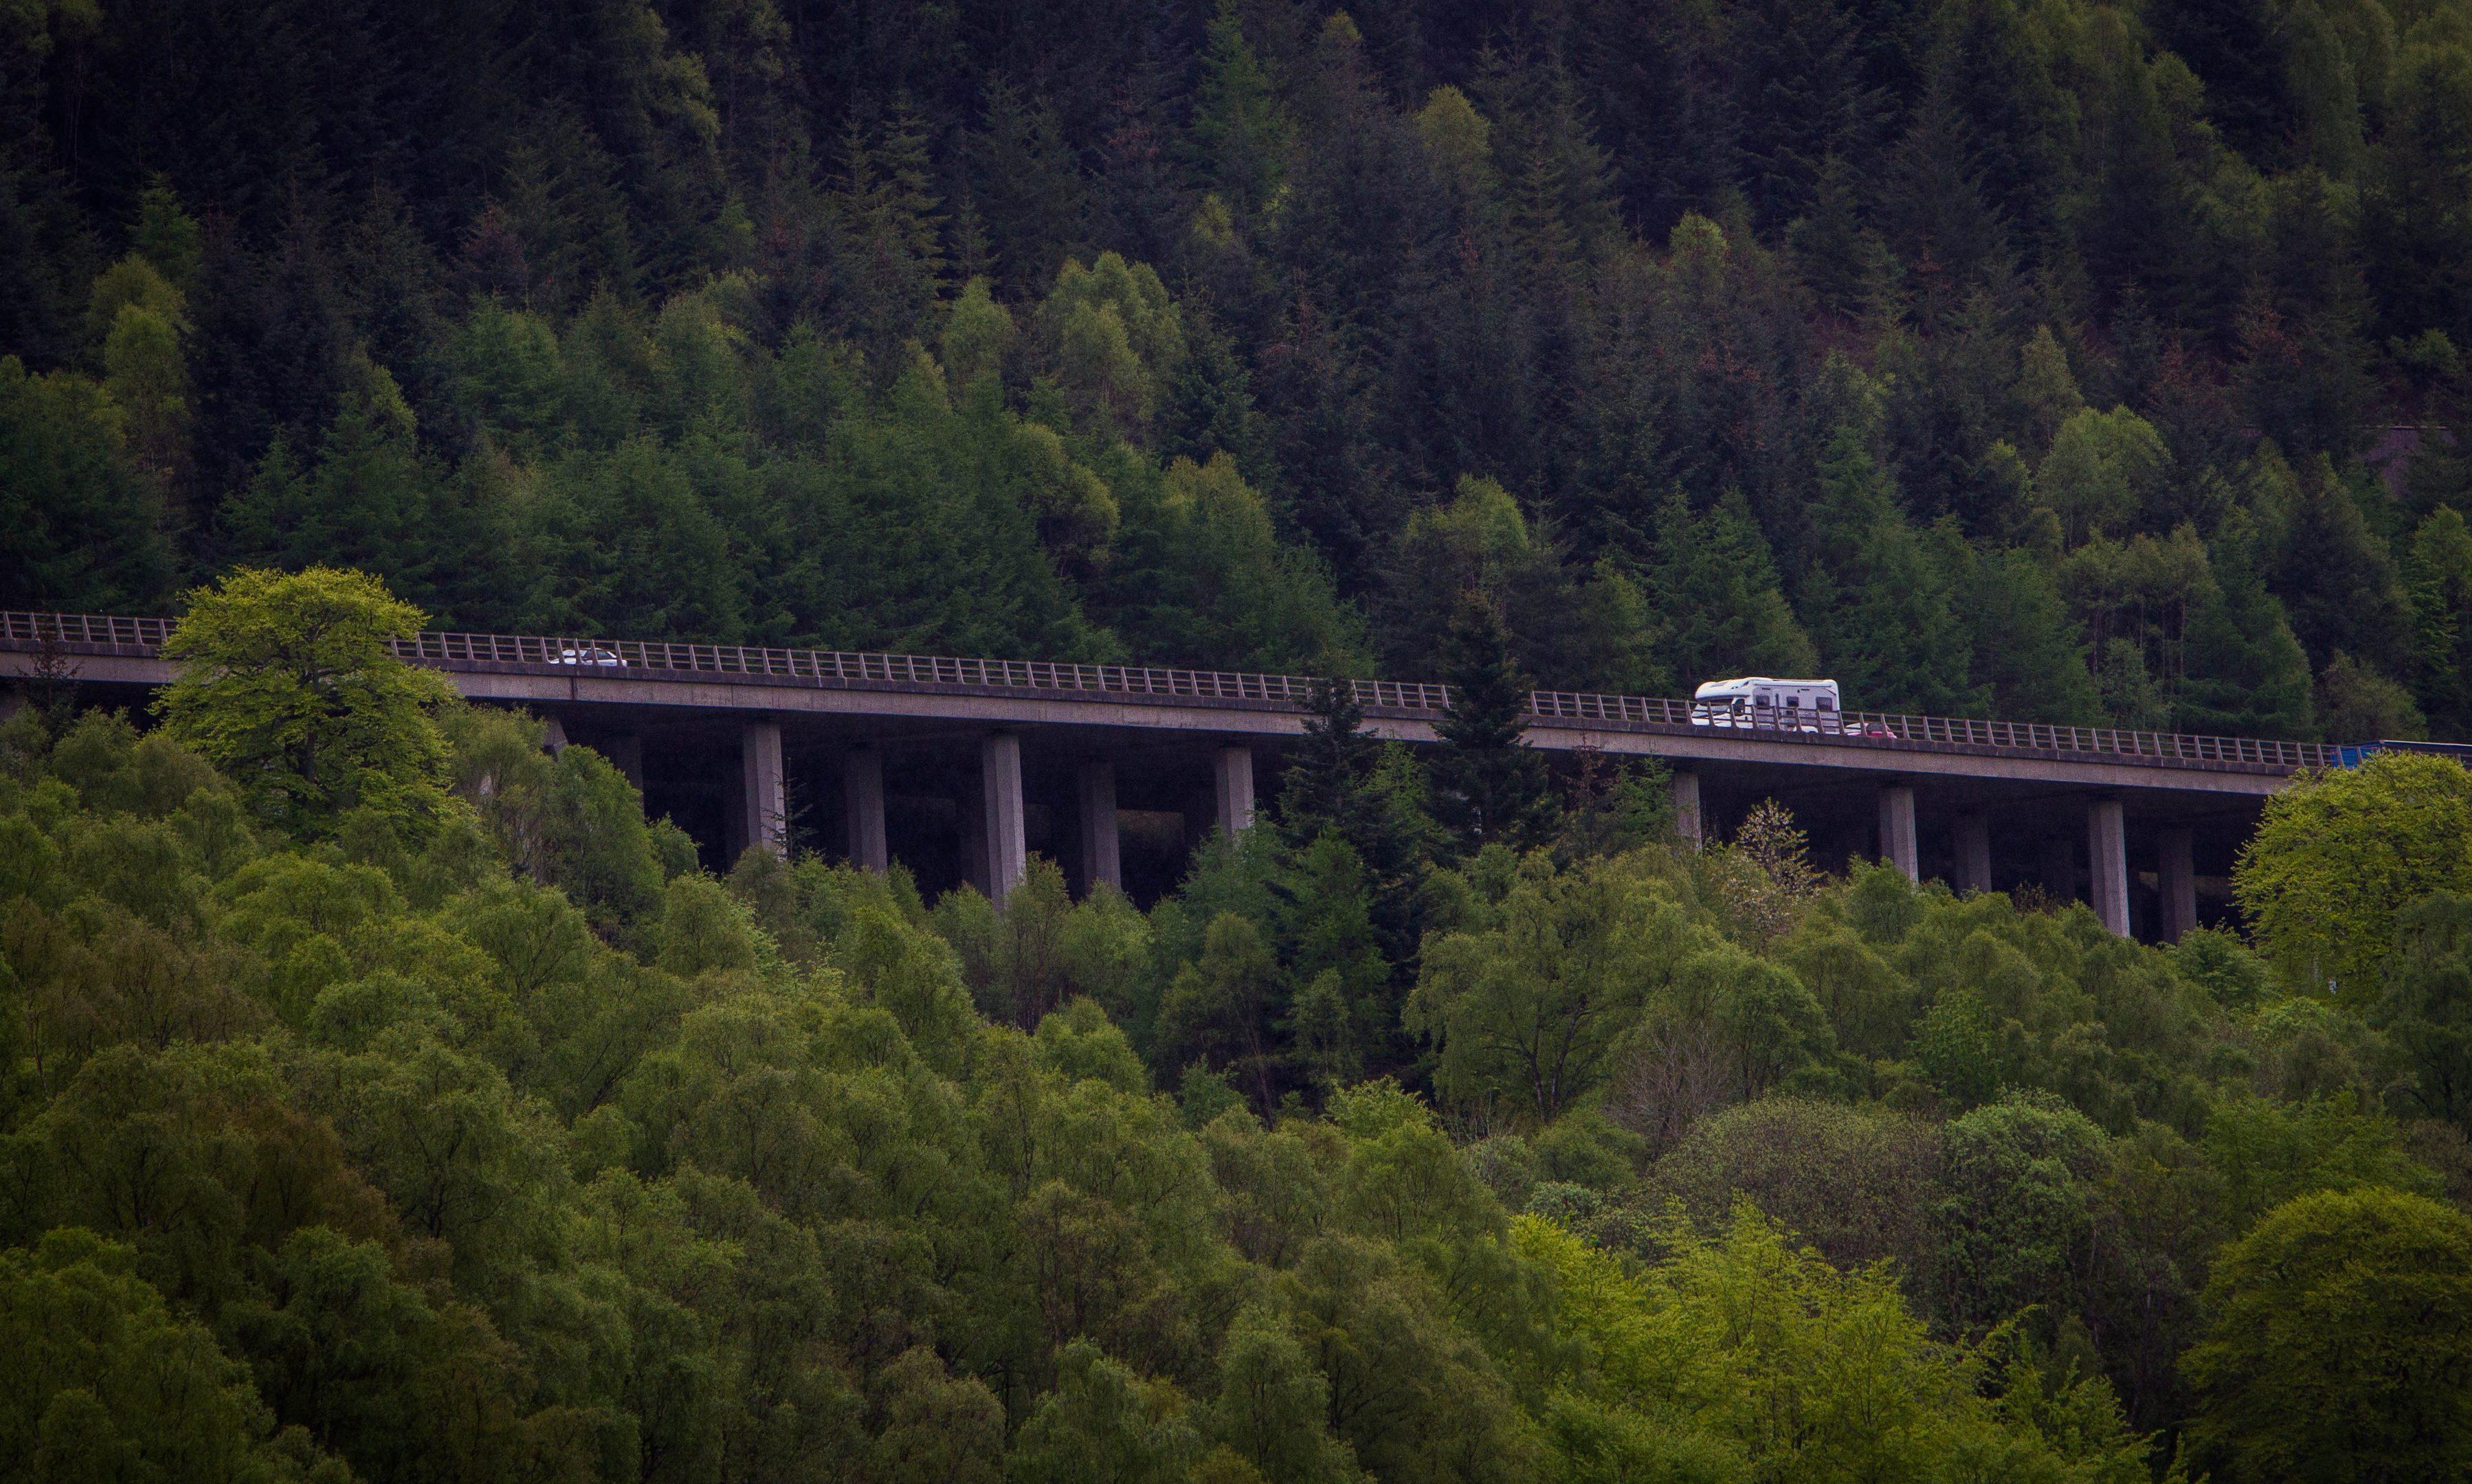 The A9 near Killiecrankie